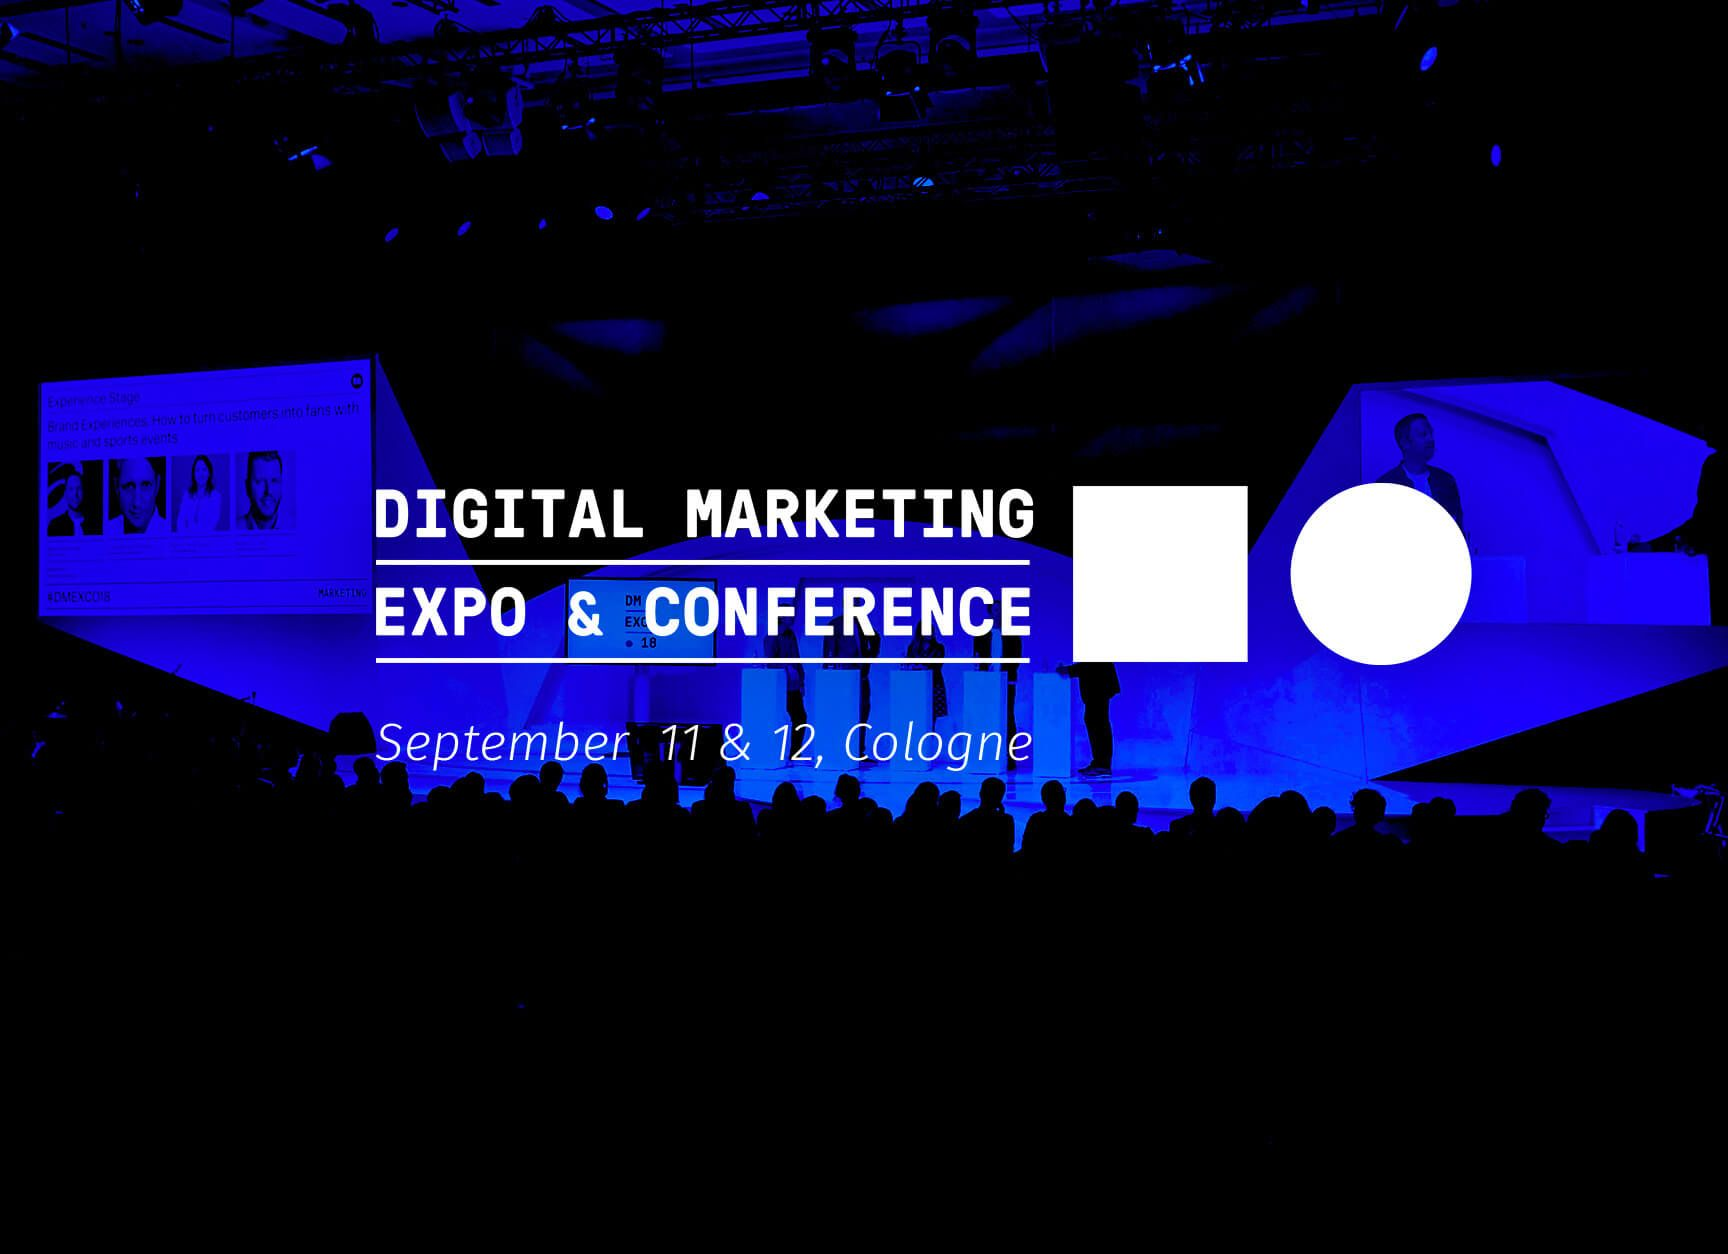 DMEXCO: diva-e at the hotspot for e-commerce & marketing of the future